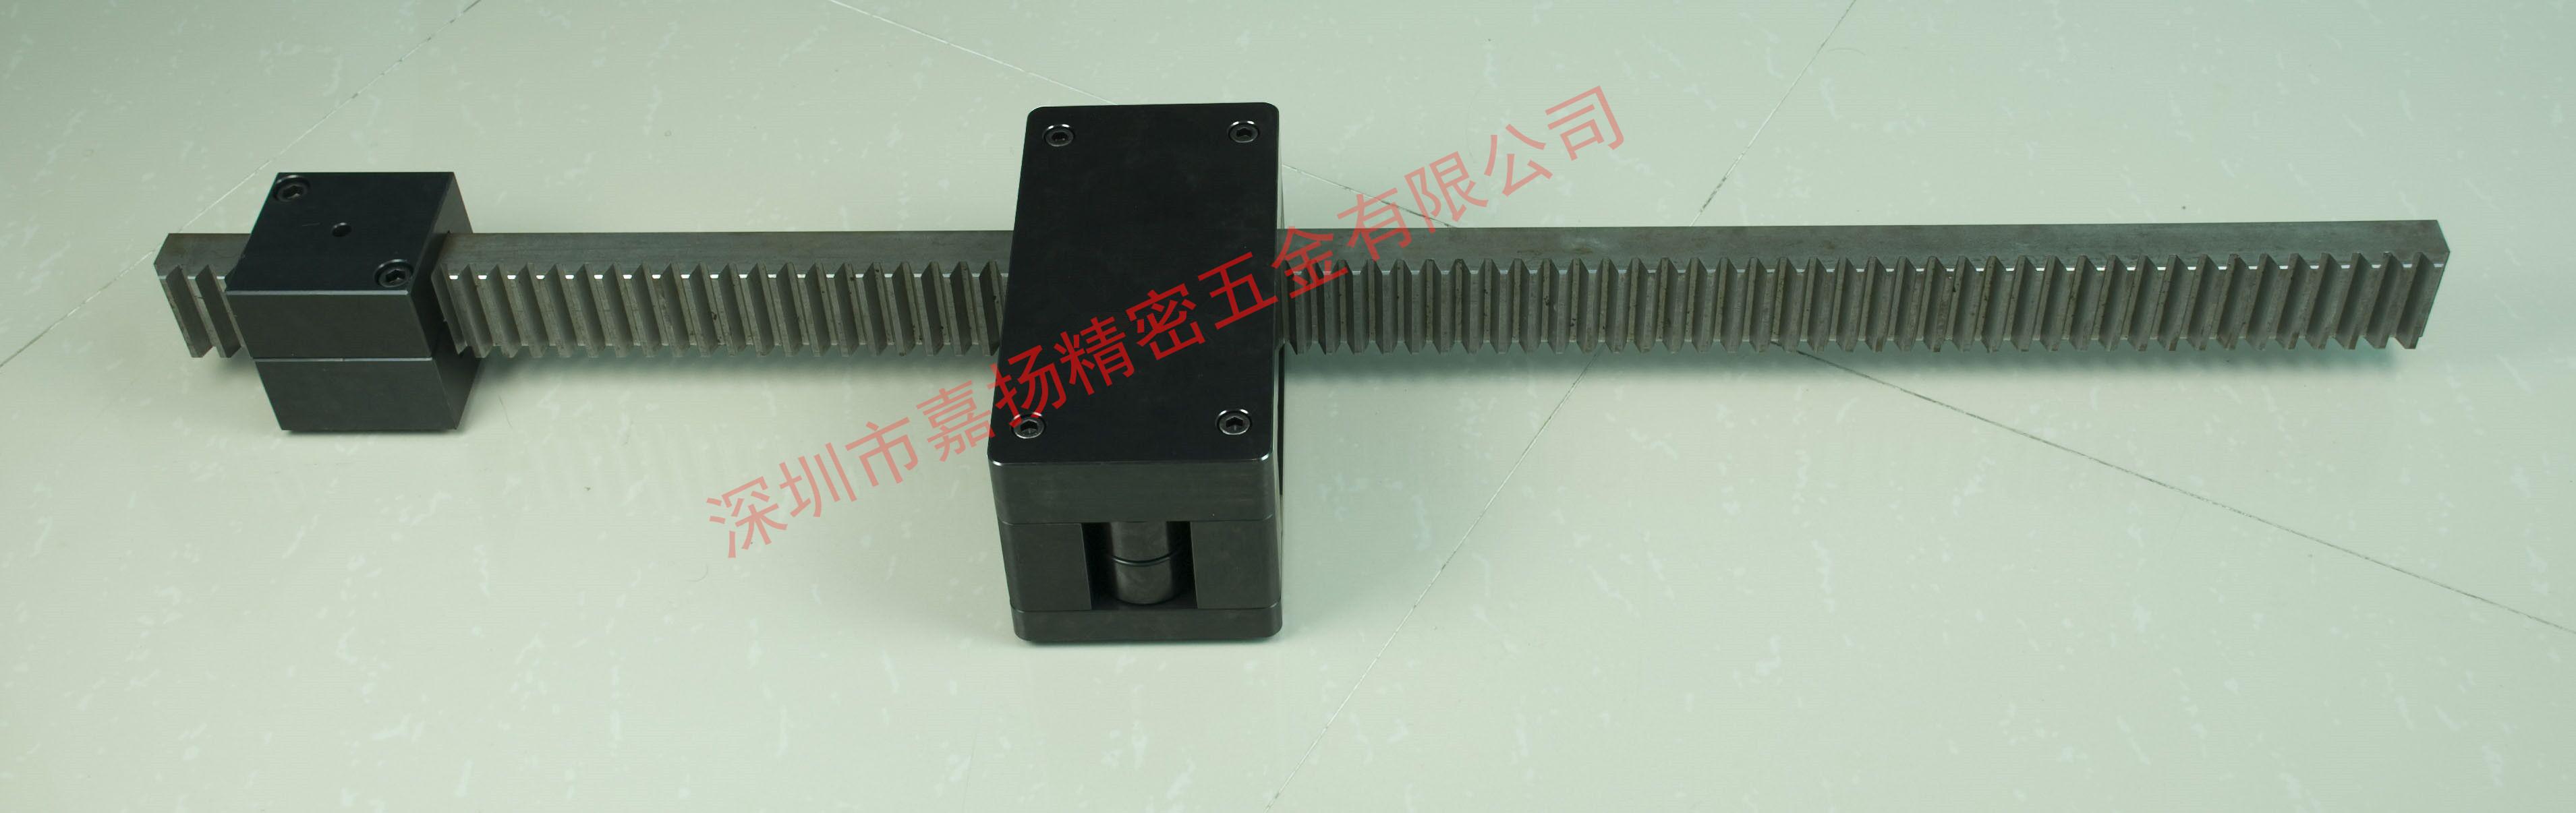 供应PROGRESSIVE齿轮齿条锁模器,锁模扣 SK-GHA-250